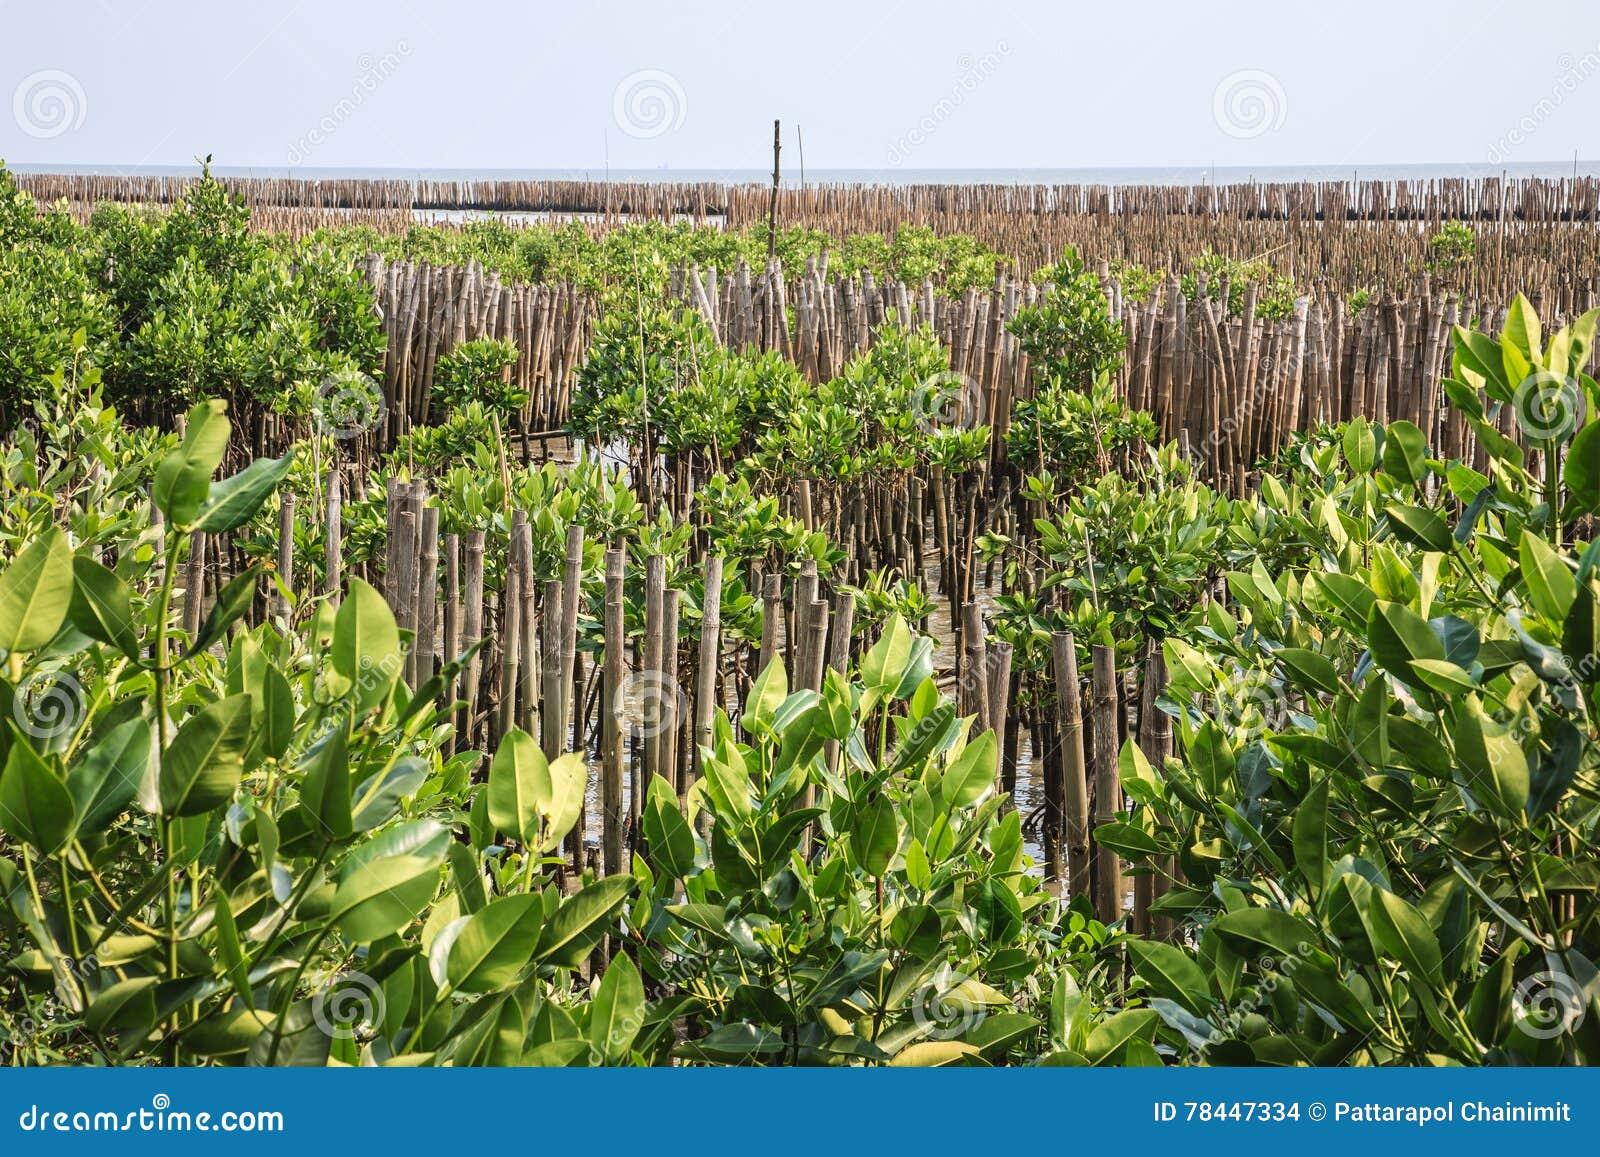 Bamboo Fence Protect Sandbank From Sea Wave Stock Photo - Image of